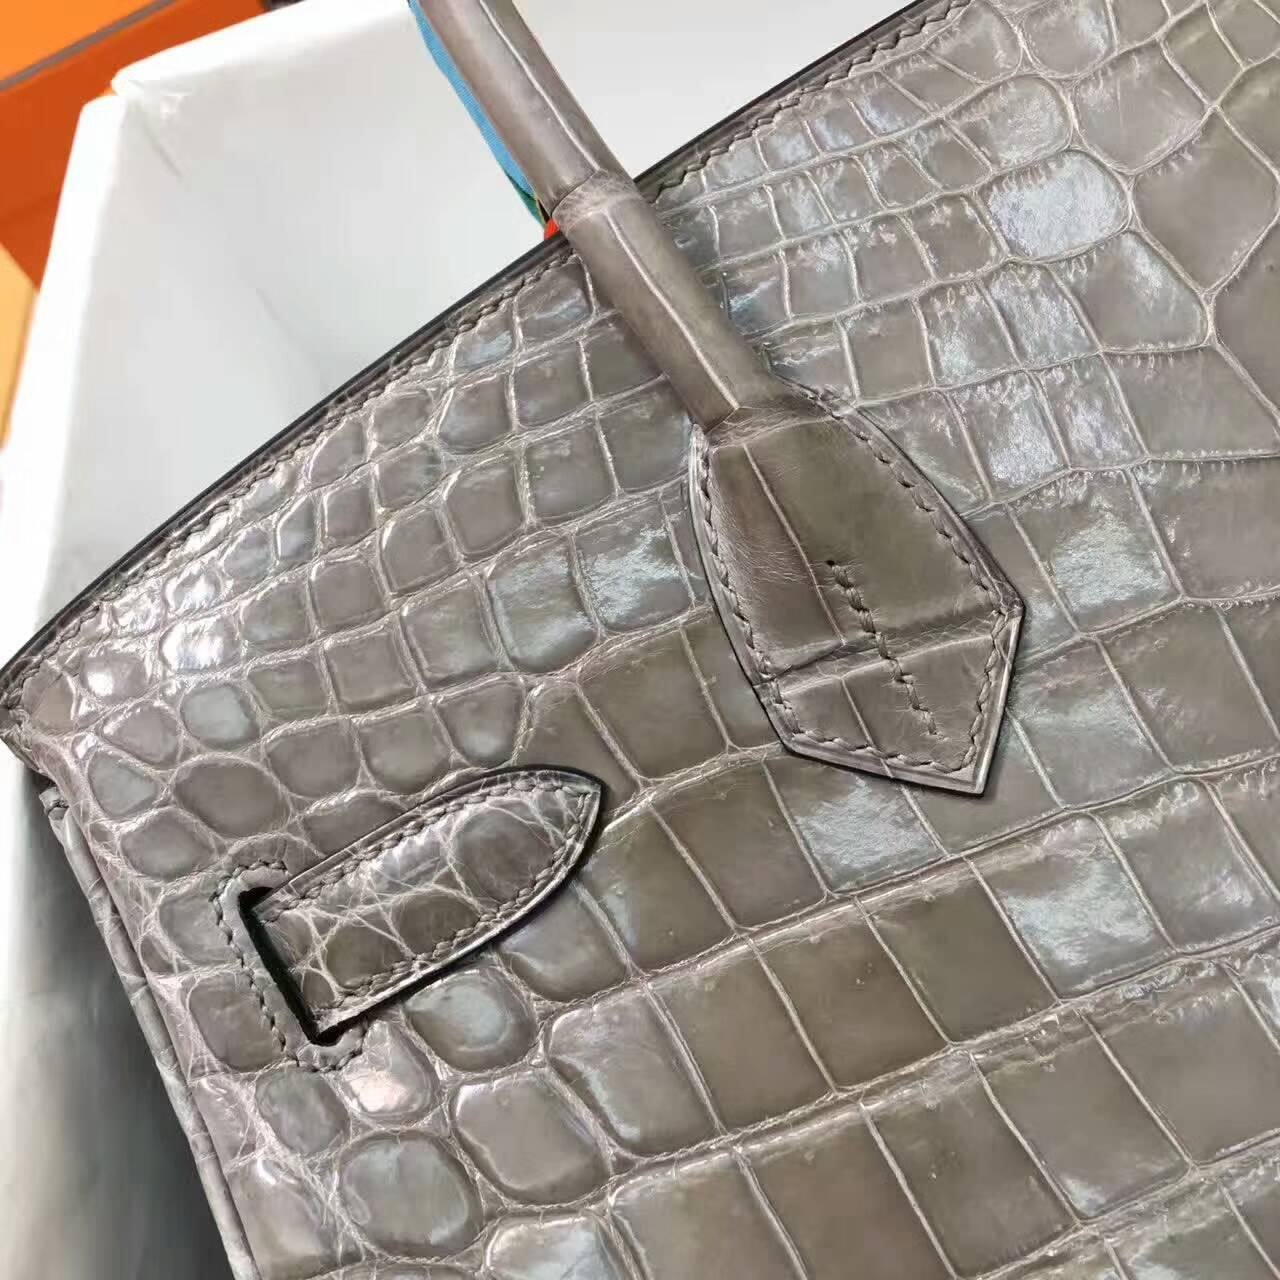 Birkin铂金包 Hermes包包 30cm Shiny Niloticus Crocodile 雾面两点非洲原产尼罗鳄 18 Etoupe 大象灰 金扣